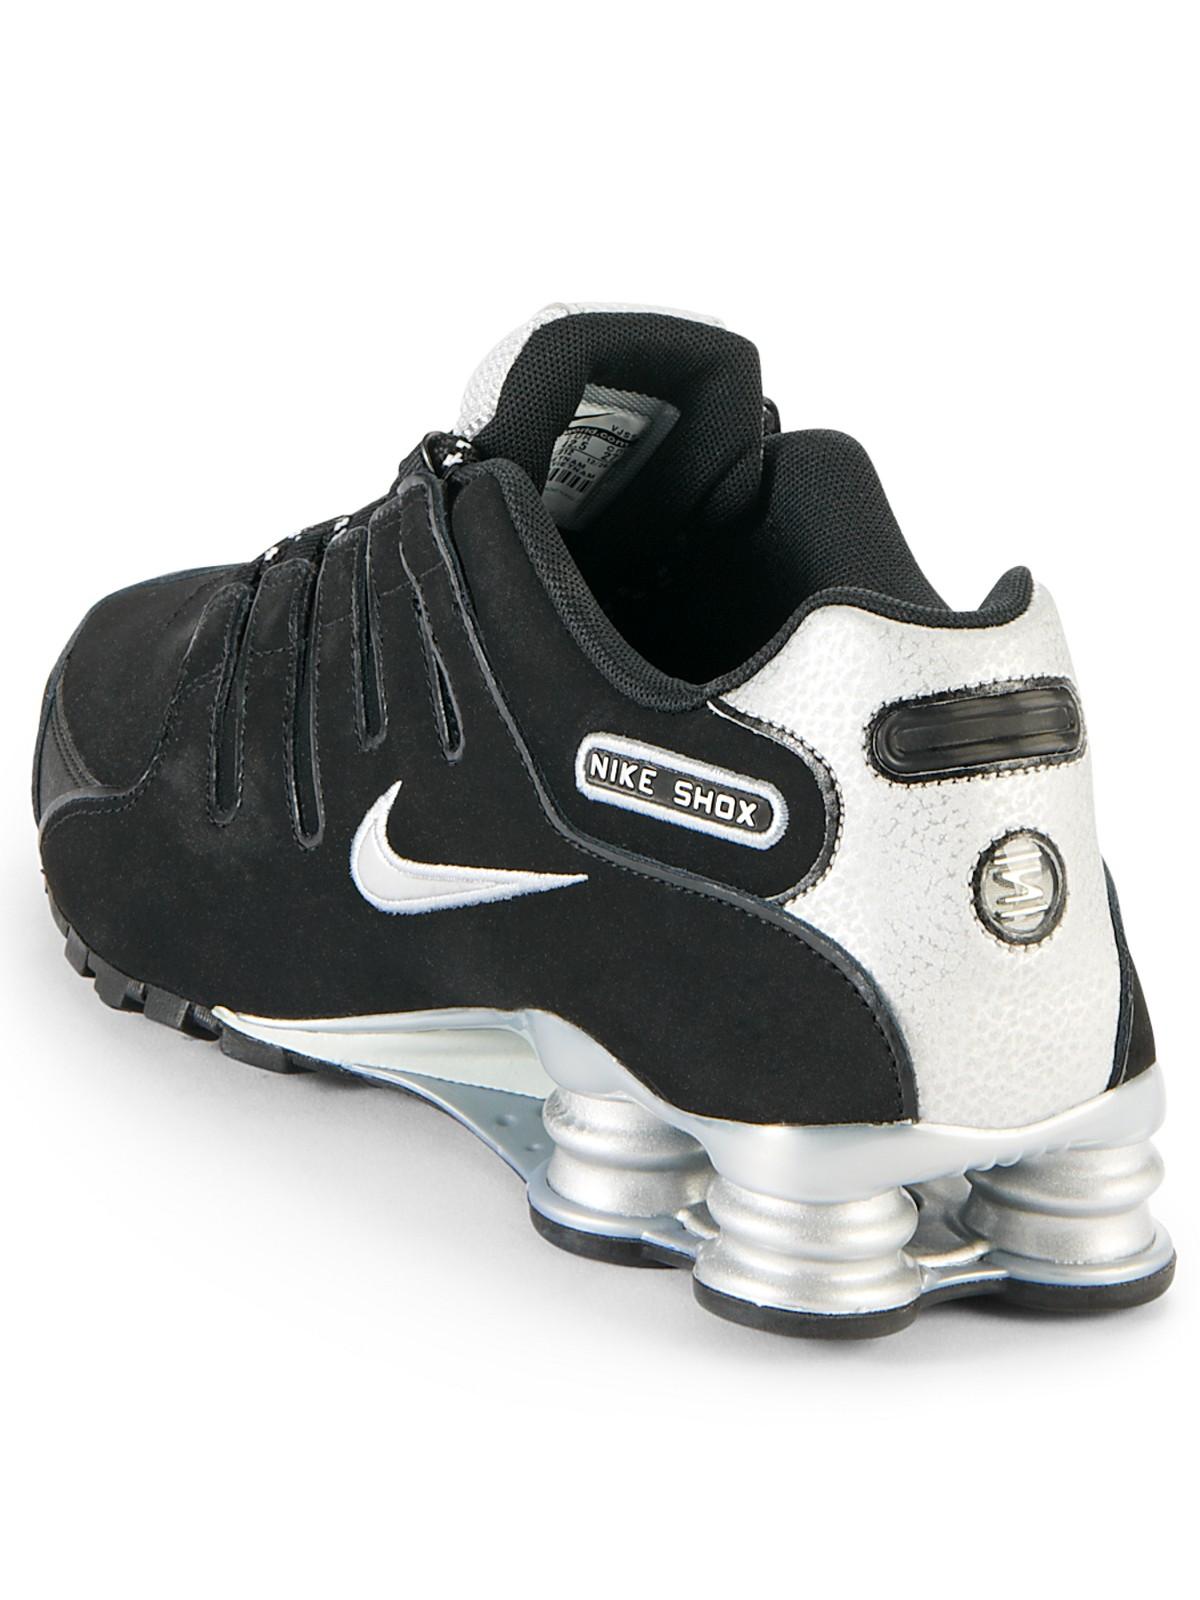 Nike Shox Nz Mens Trainers